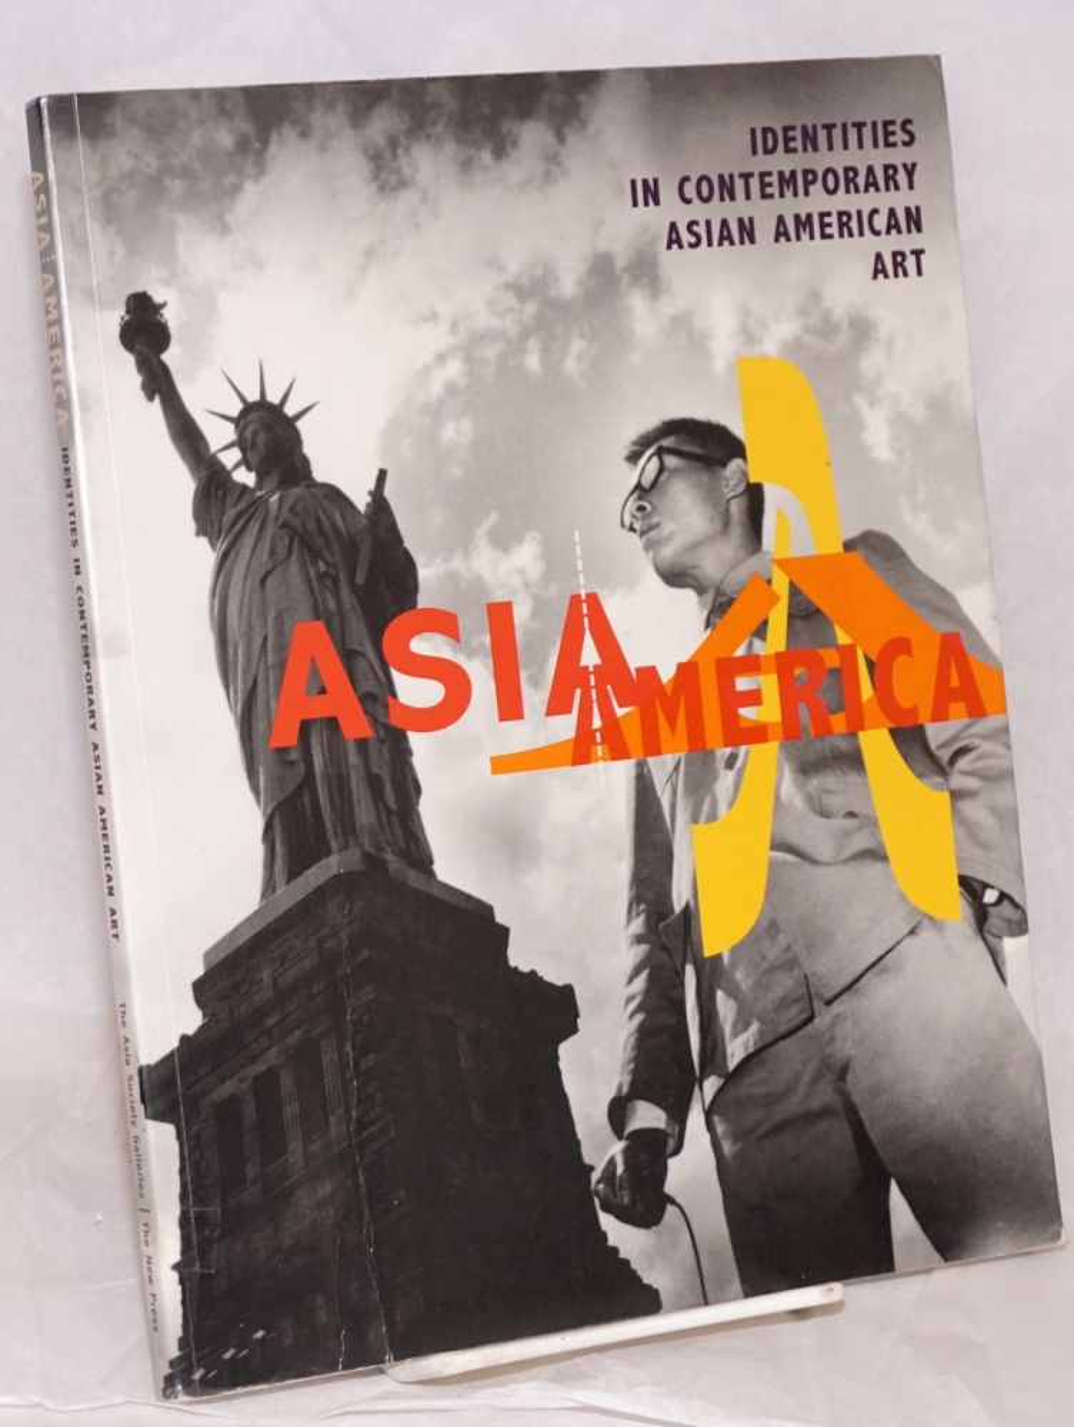 Asia/America; identities in contemporary Asian American art, essay